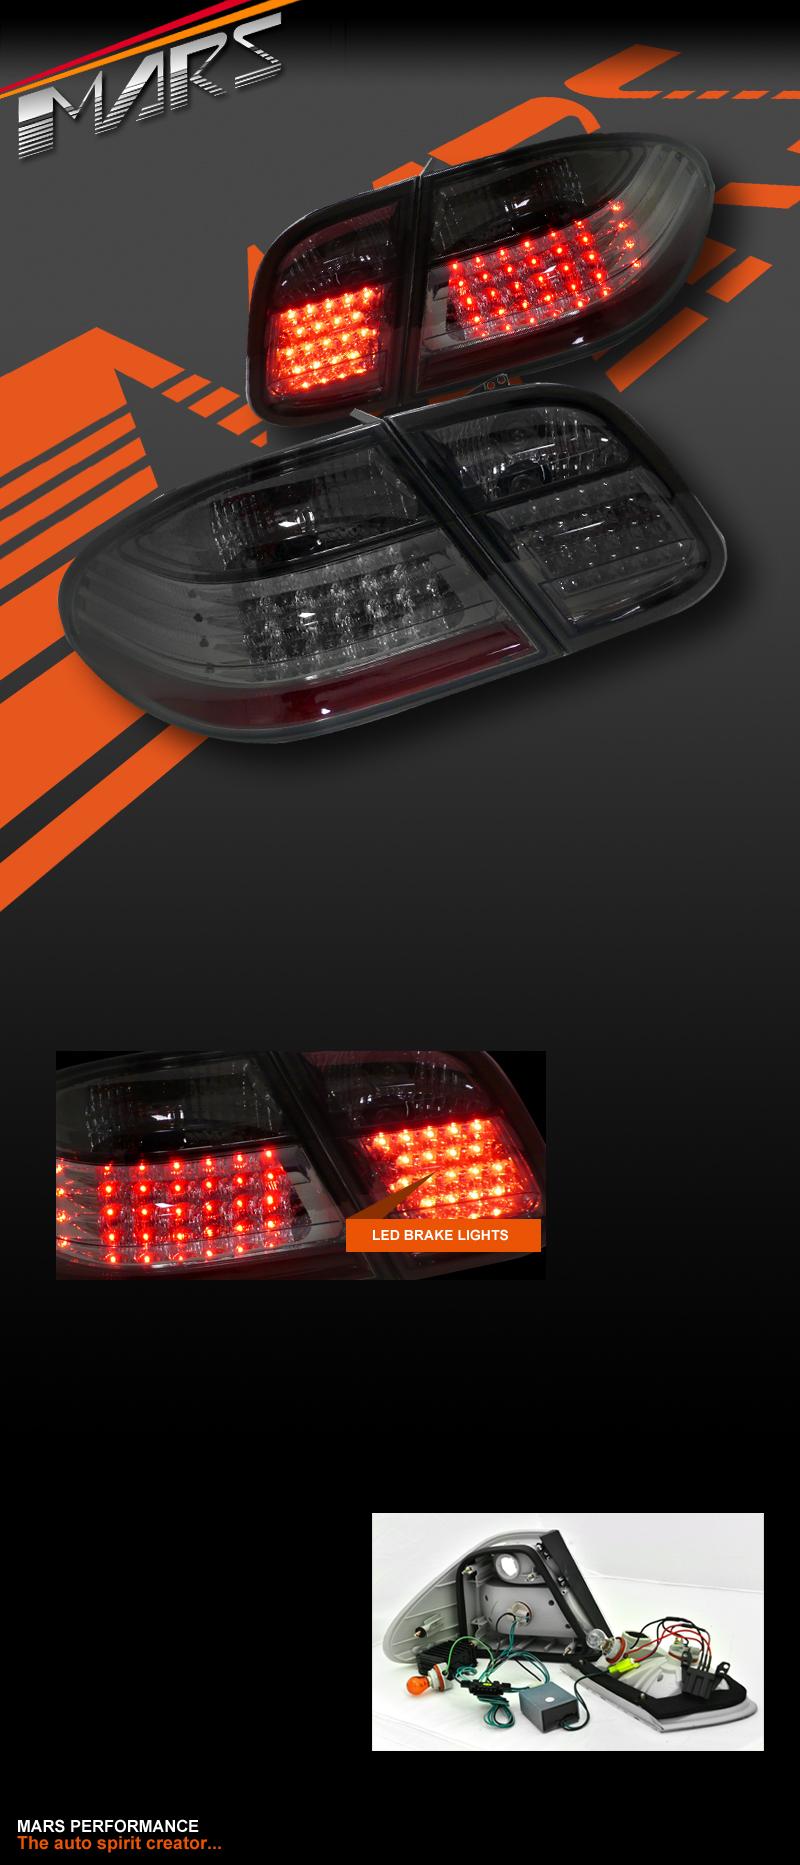 Smoked Led Tail Lights Mercedes Benz Clk W208 C208 Clk200 Clk230 Clk320 Clk430 Ebay